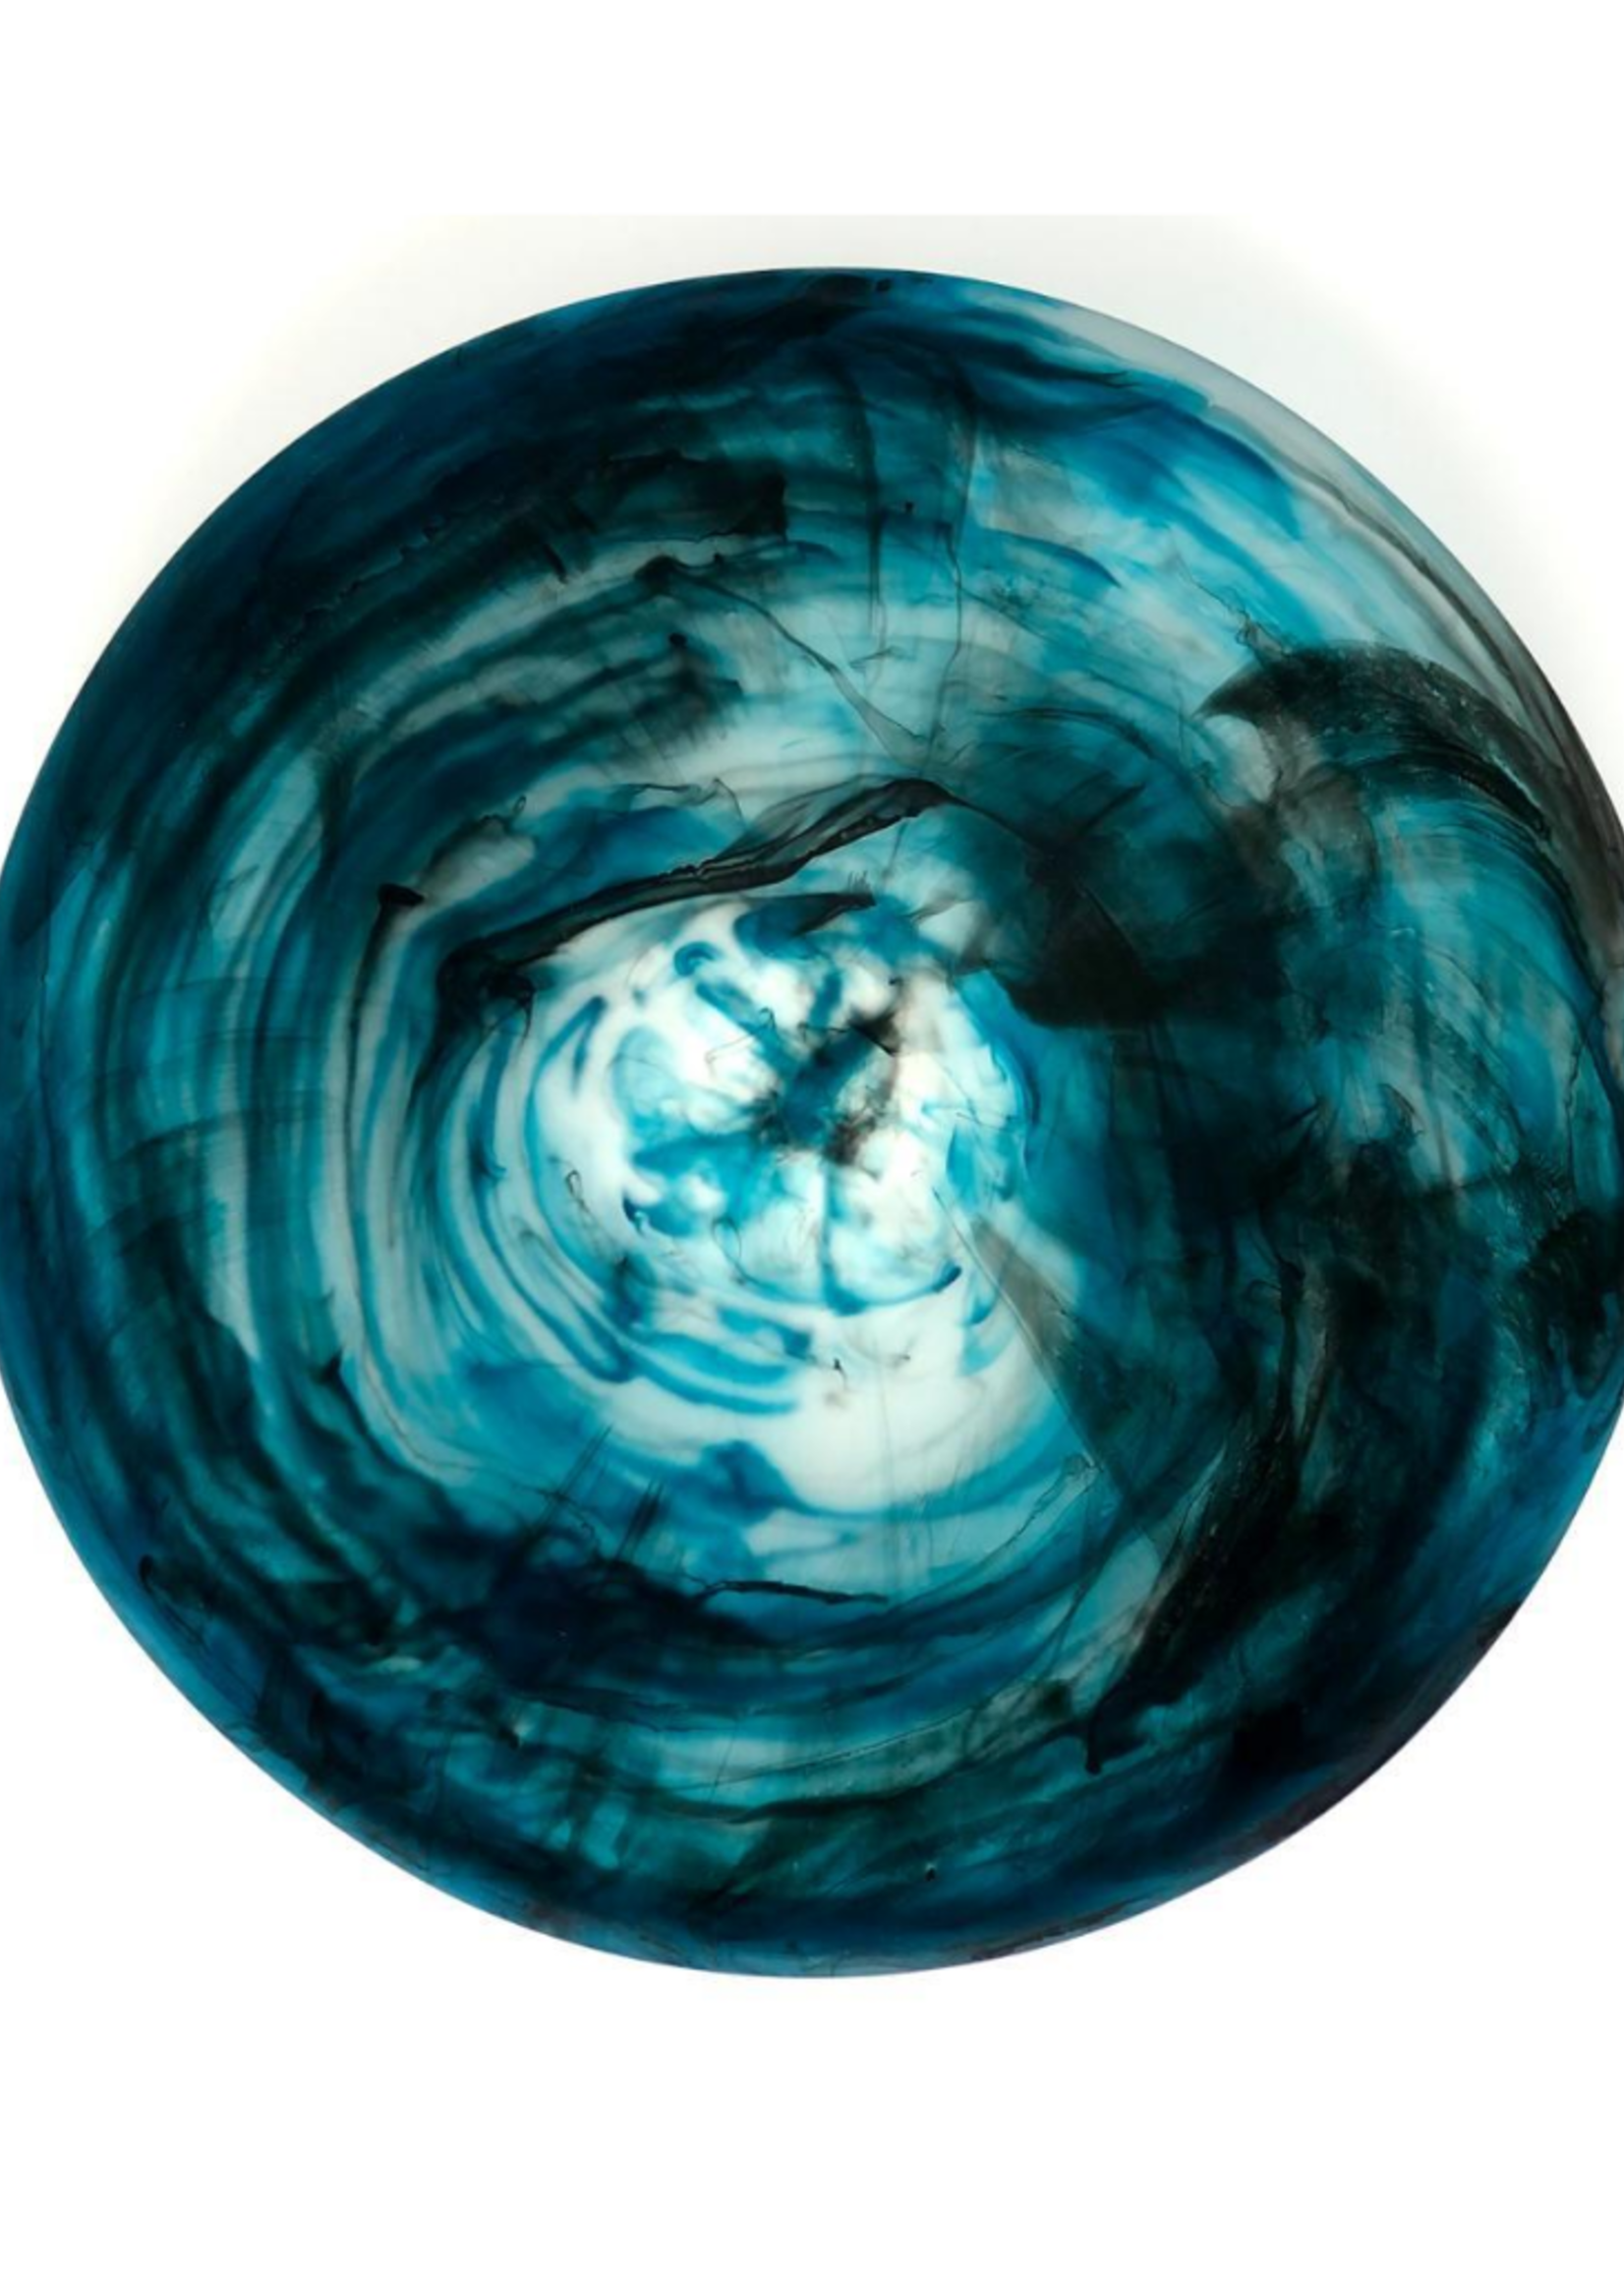 Teal Swirl Medium Bowl With Servers